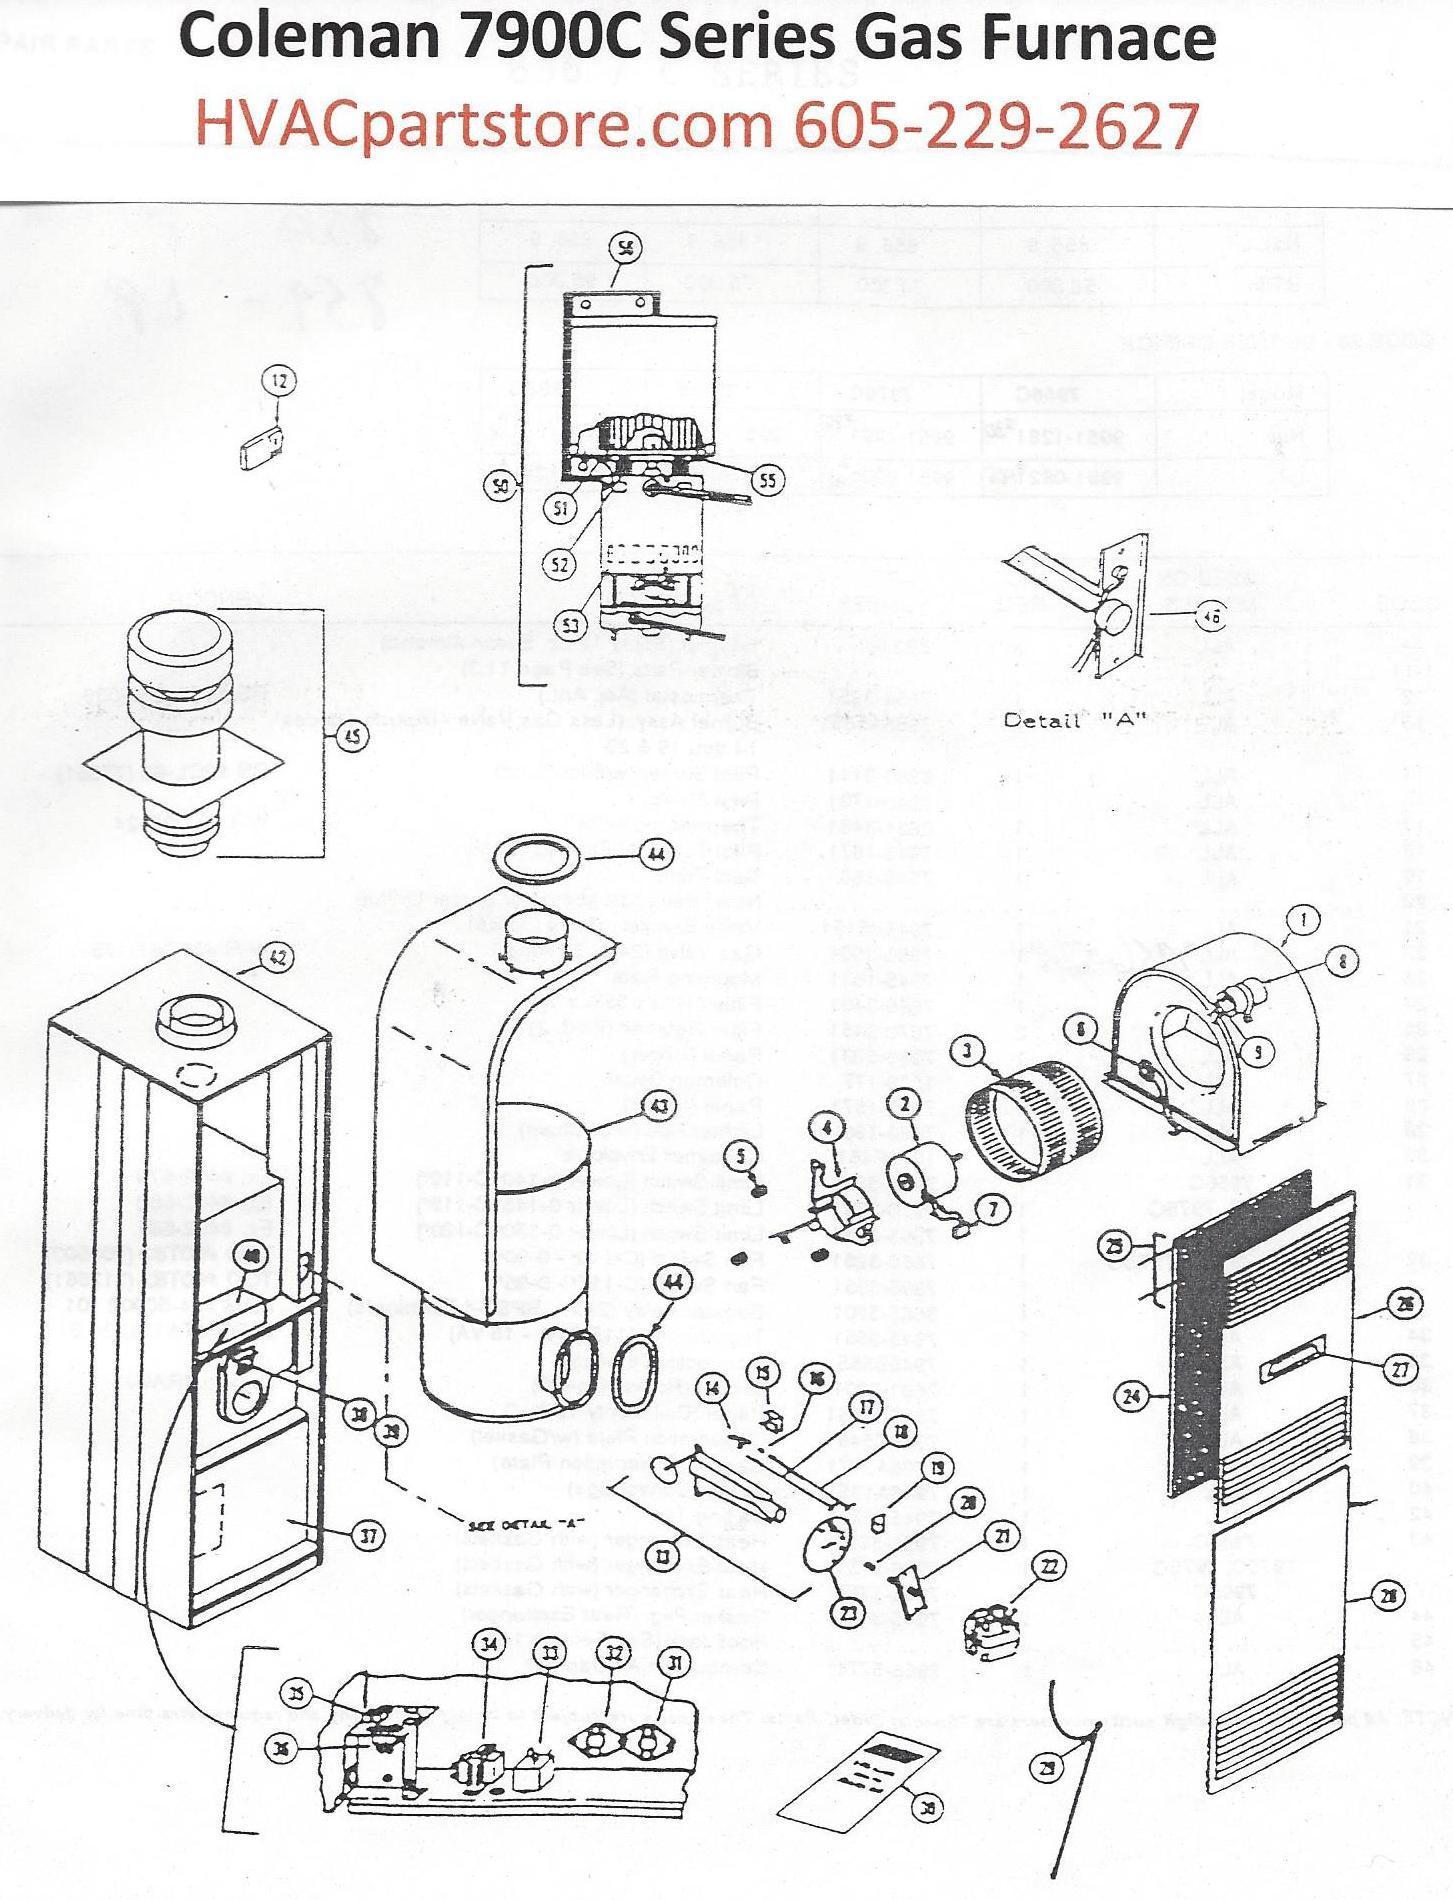 Na Furnace Wiring Diagram Moreover Coleman Gas